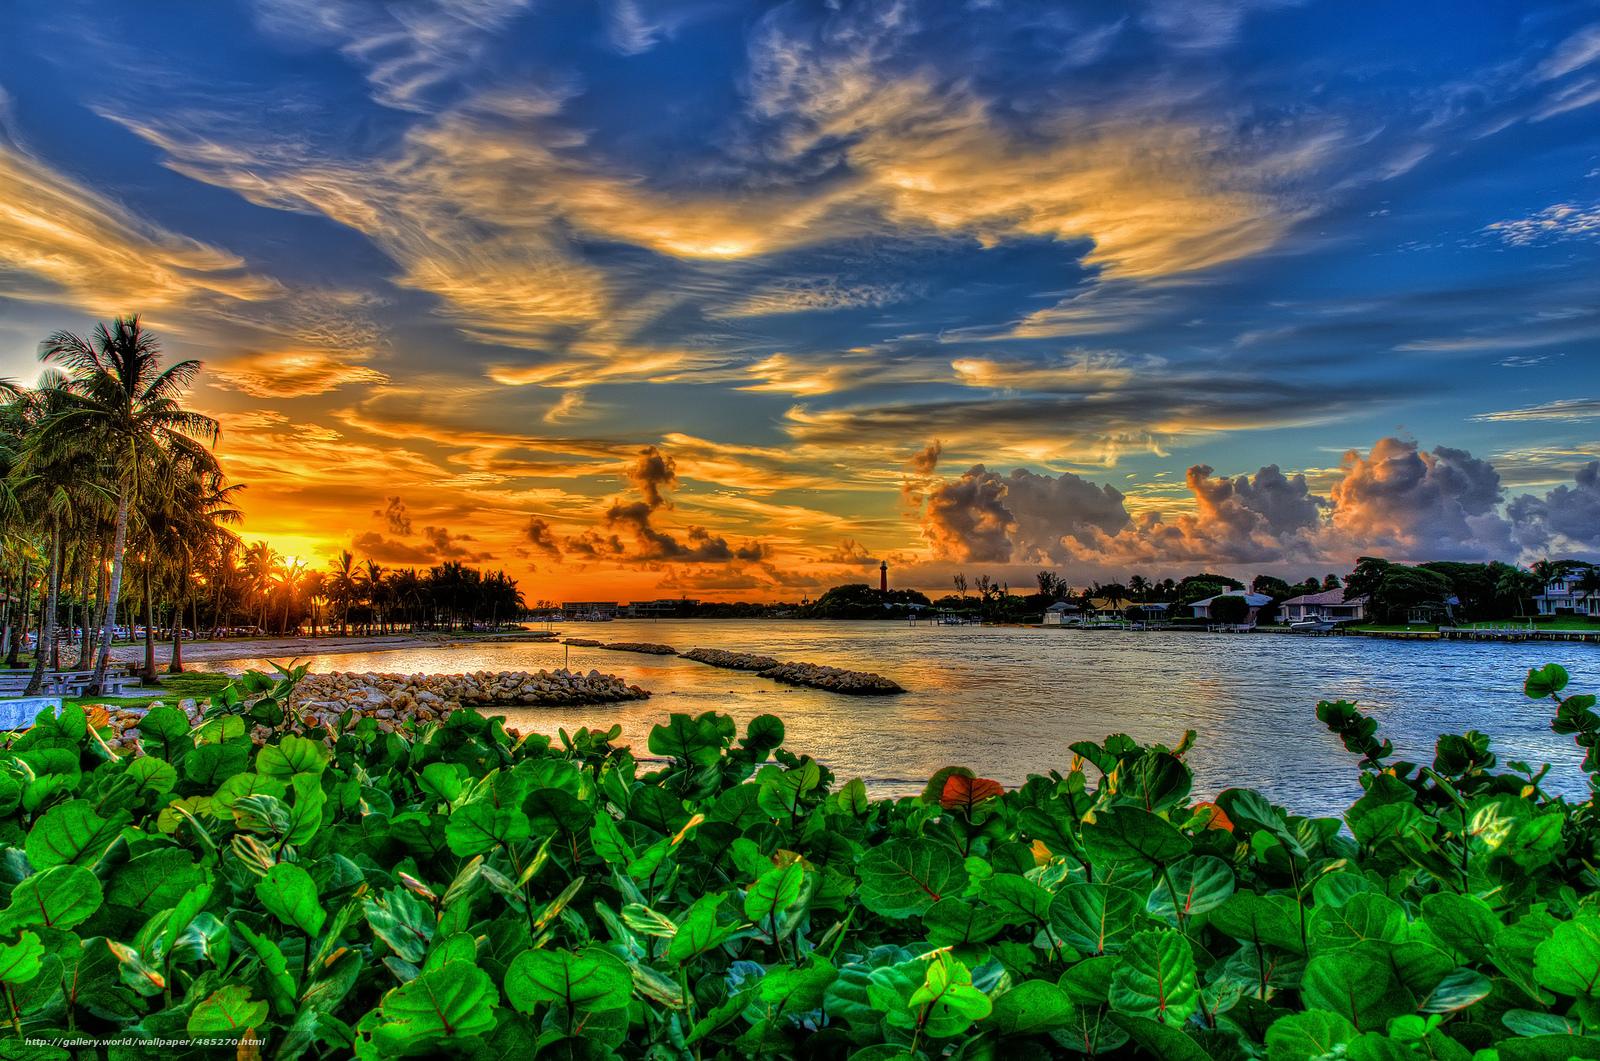 Download wallpaper dubois park jupiter florida Florida desktop 1600x1061